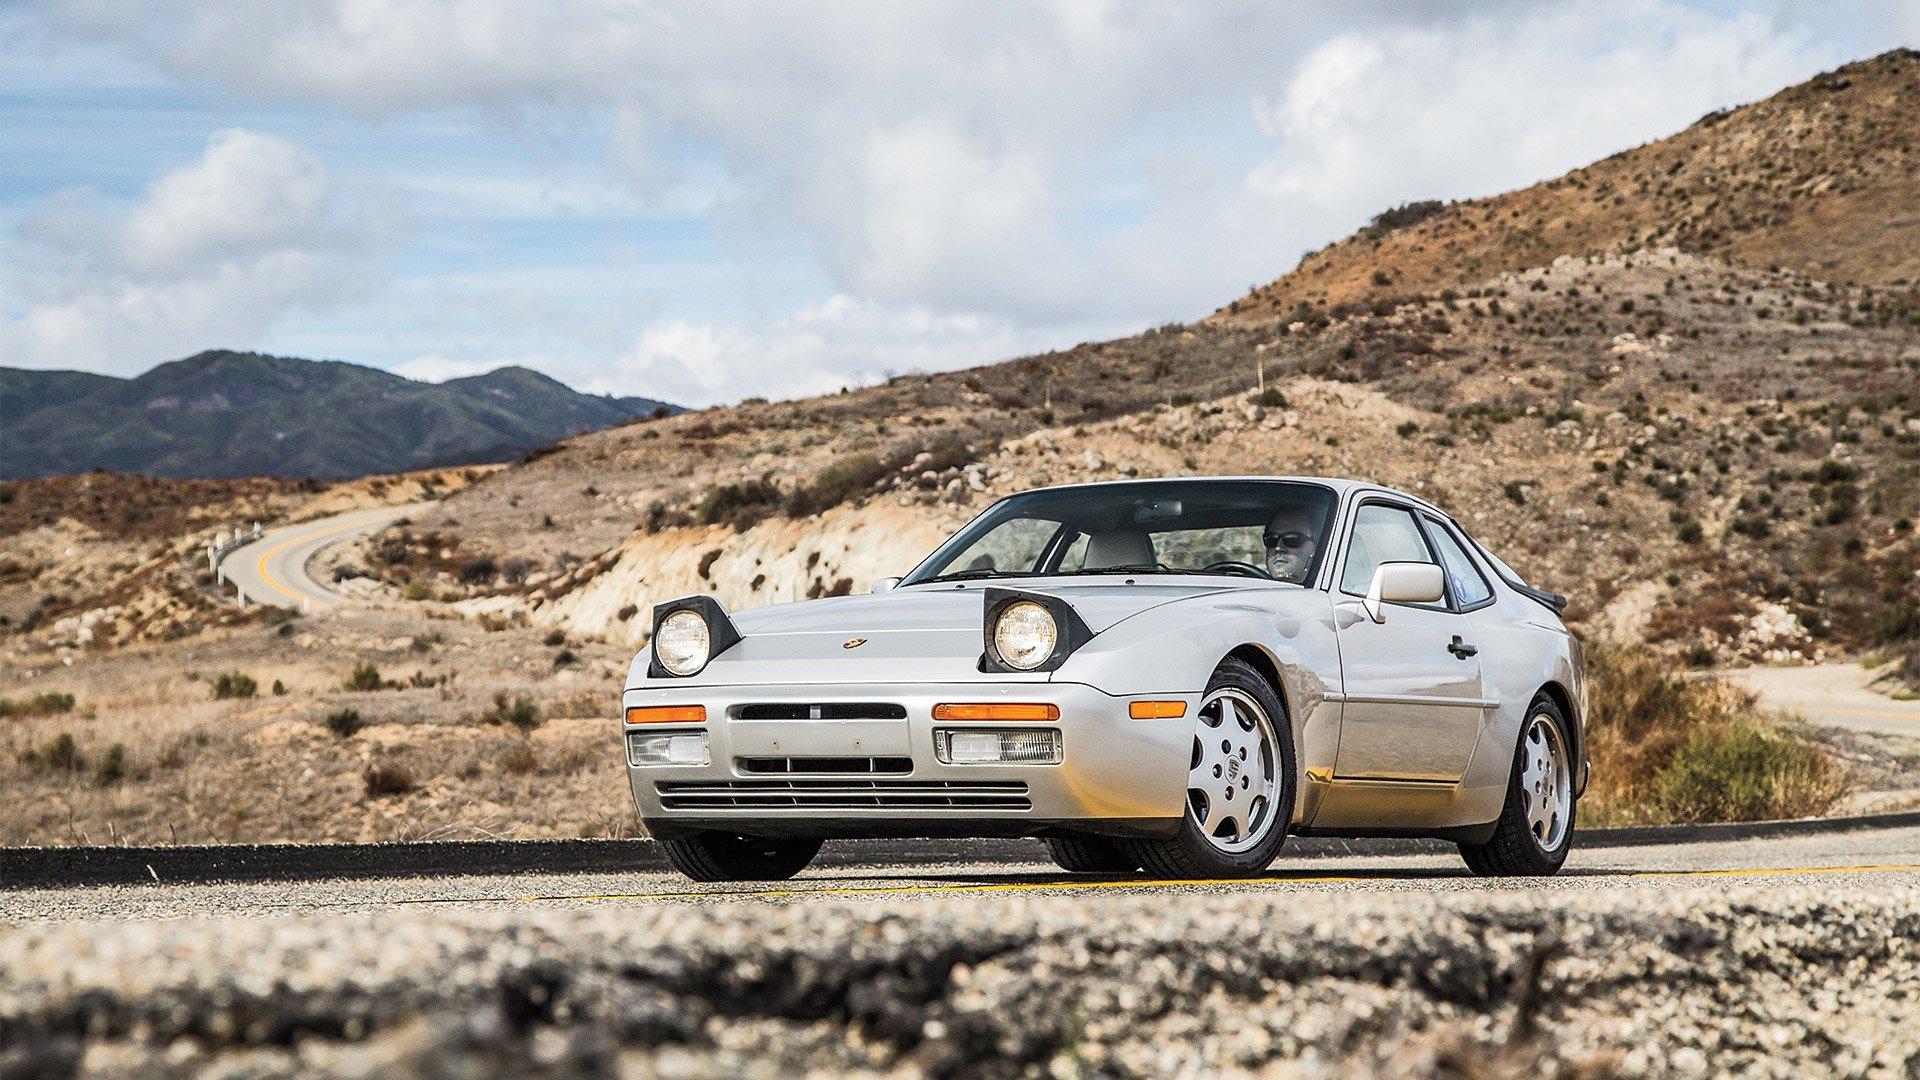 Porsche 944 Sports Car